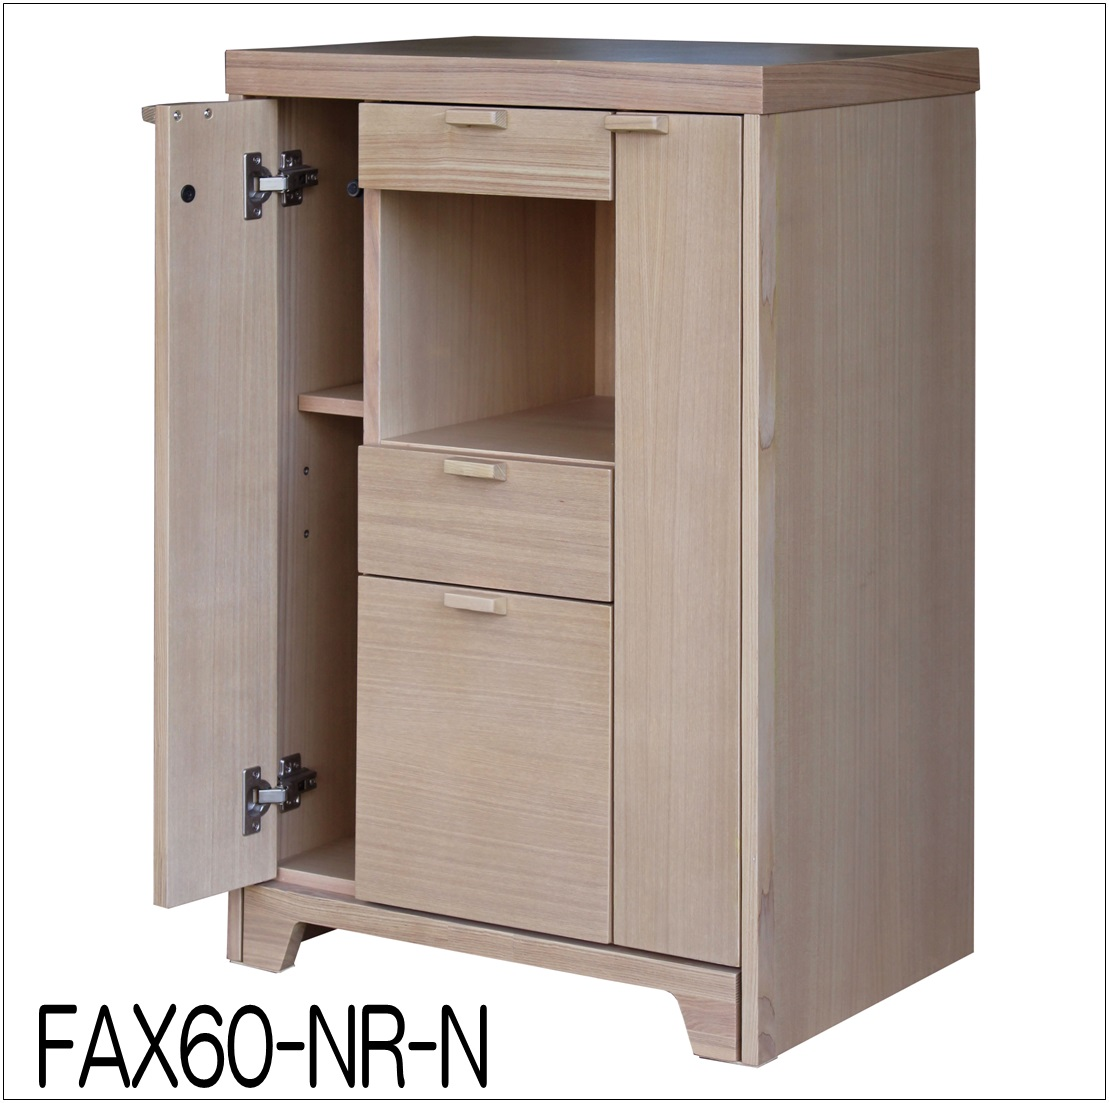 FAX台/電話台 ナチュラル(タモ突板ウレタン塗装)【FAX60-NR-N】【完成品】【送料無料】